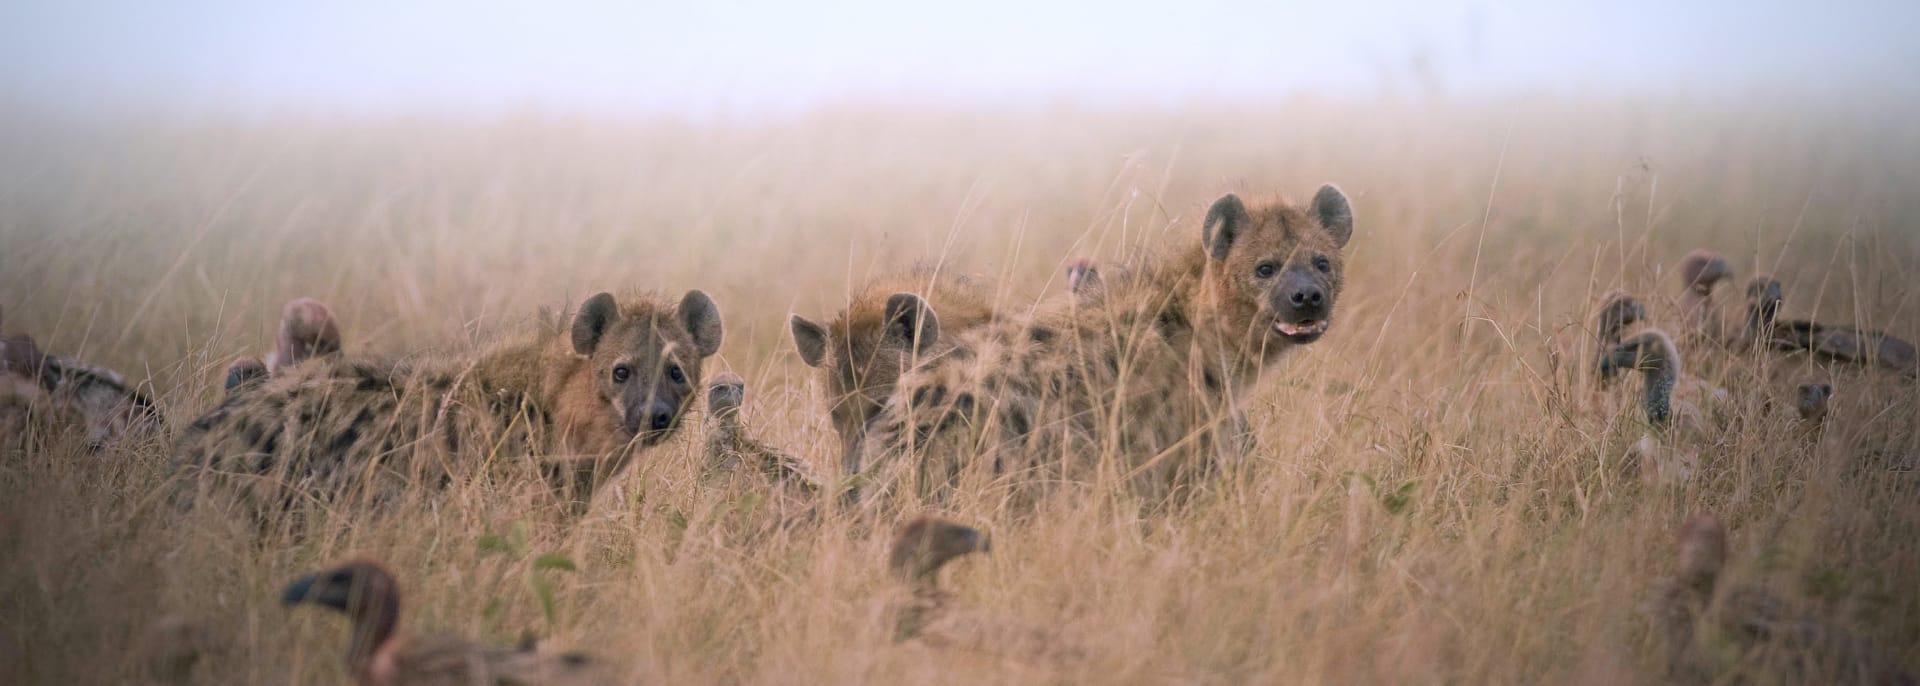 Liuwa Plain Nationalpark, Sambia/Simbabwe